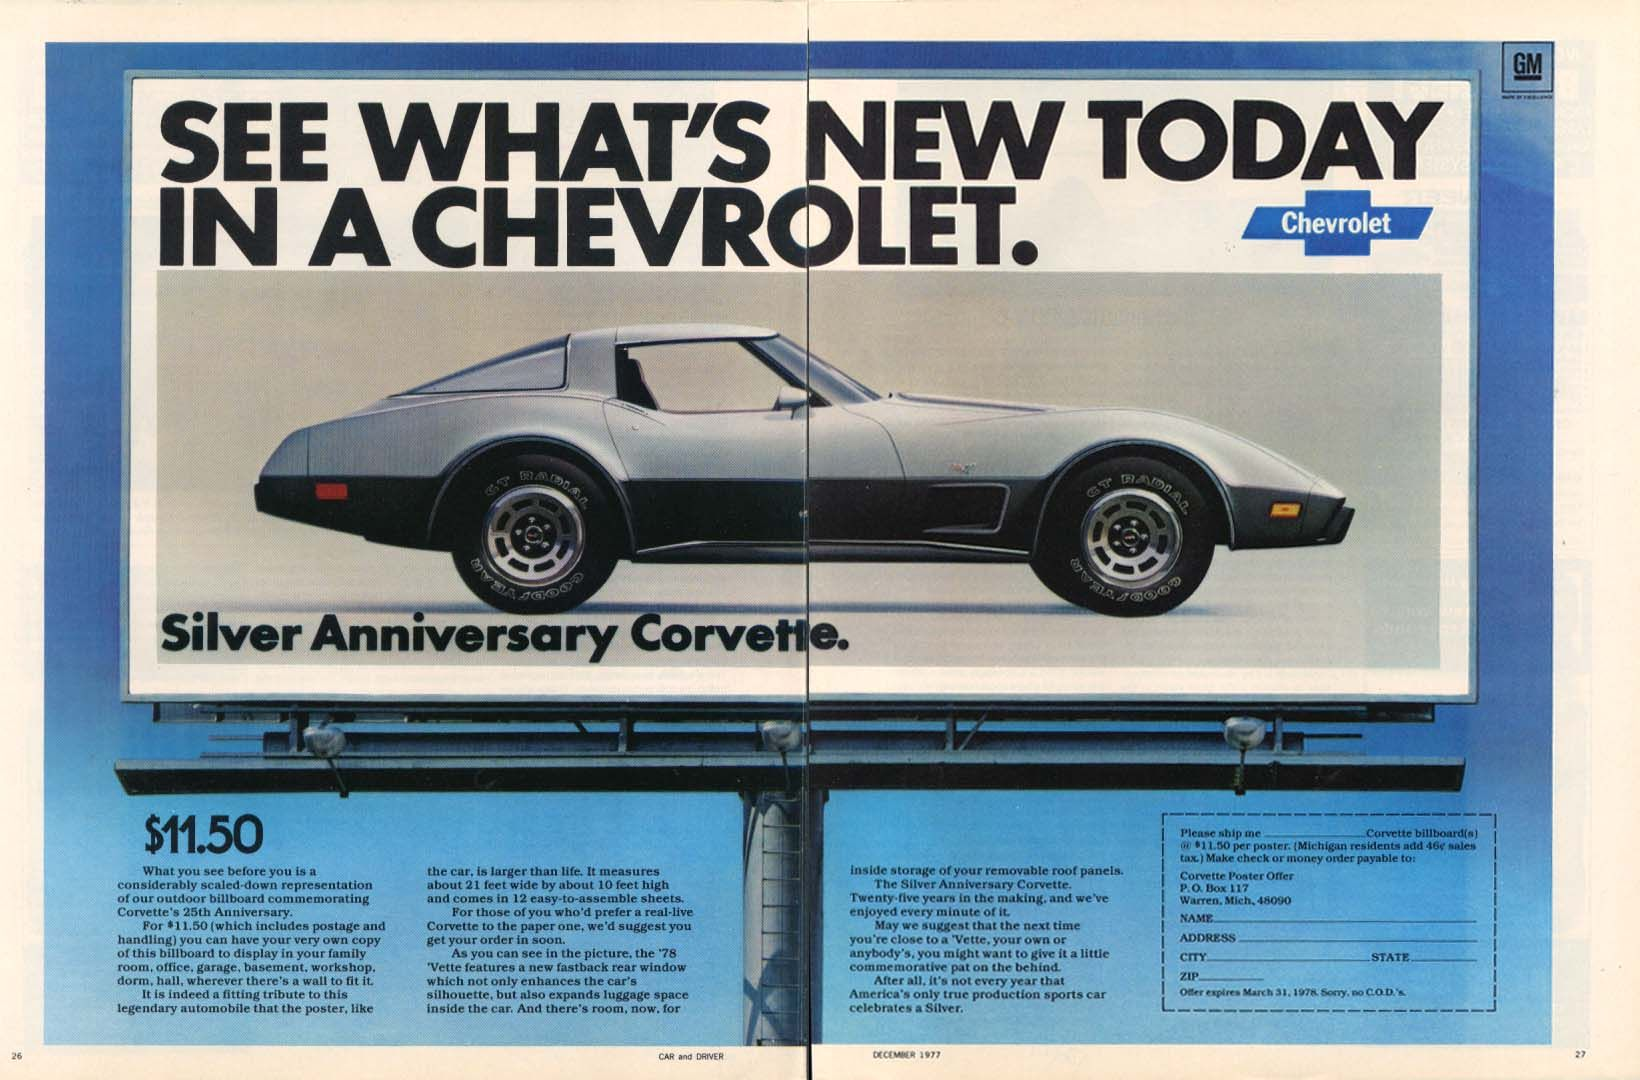 Http Www Jumpingfrog Com Images Ads Corvette 77cvt002 Jpg Corvette Vintage Corvette Automobile Advertising